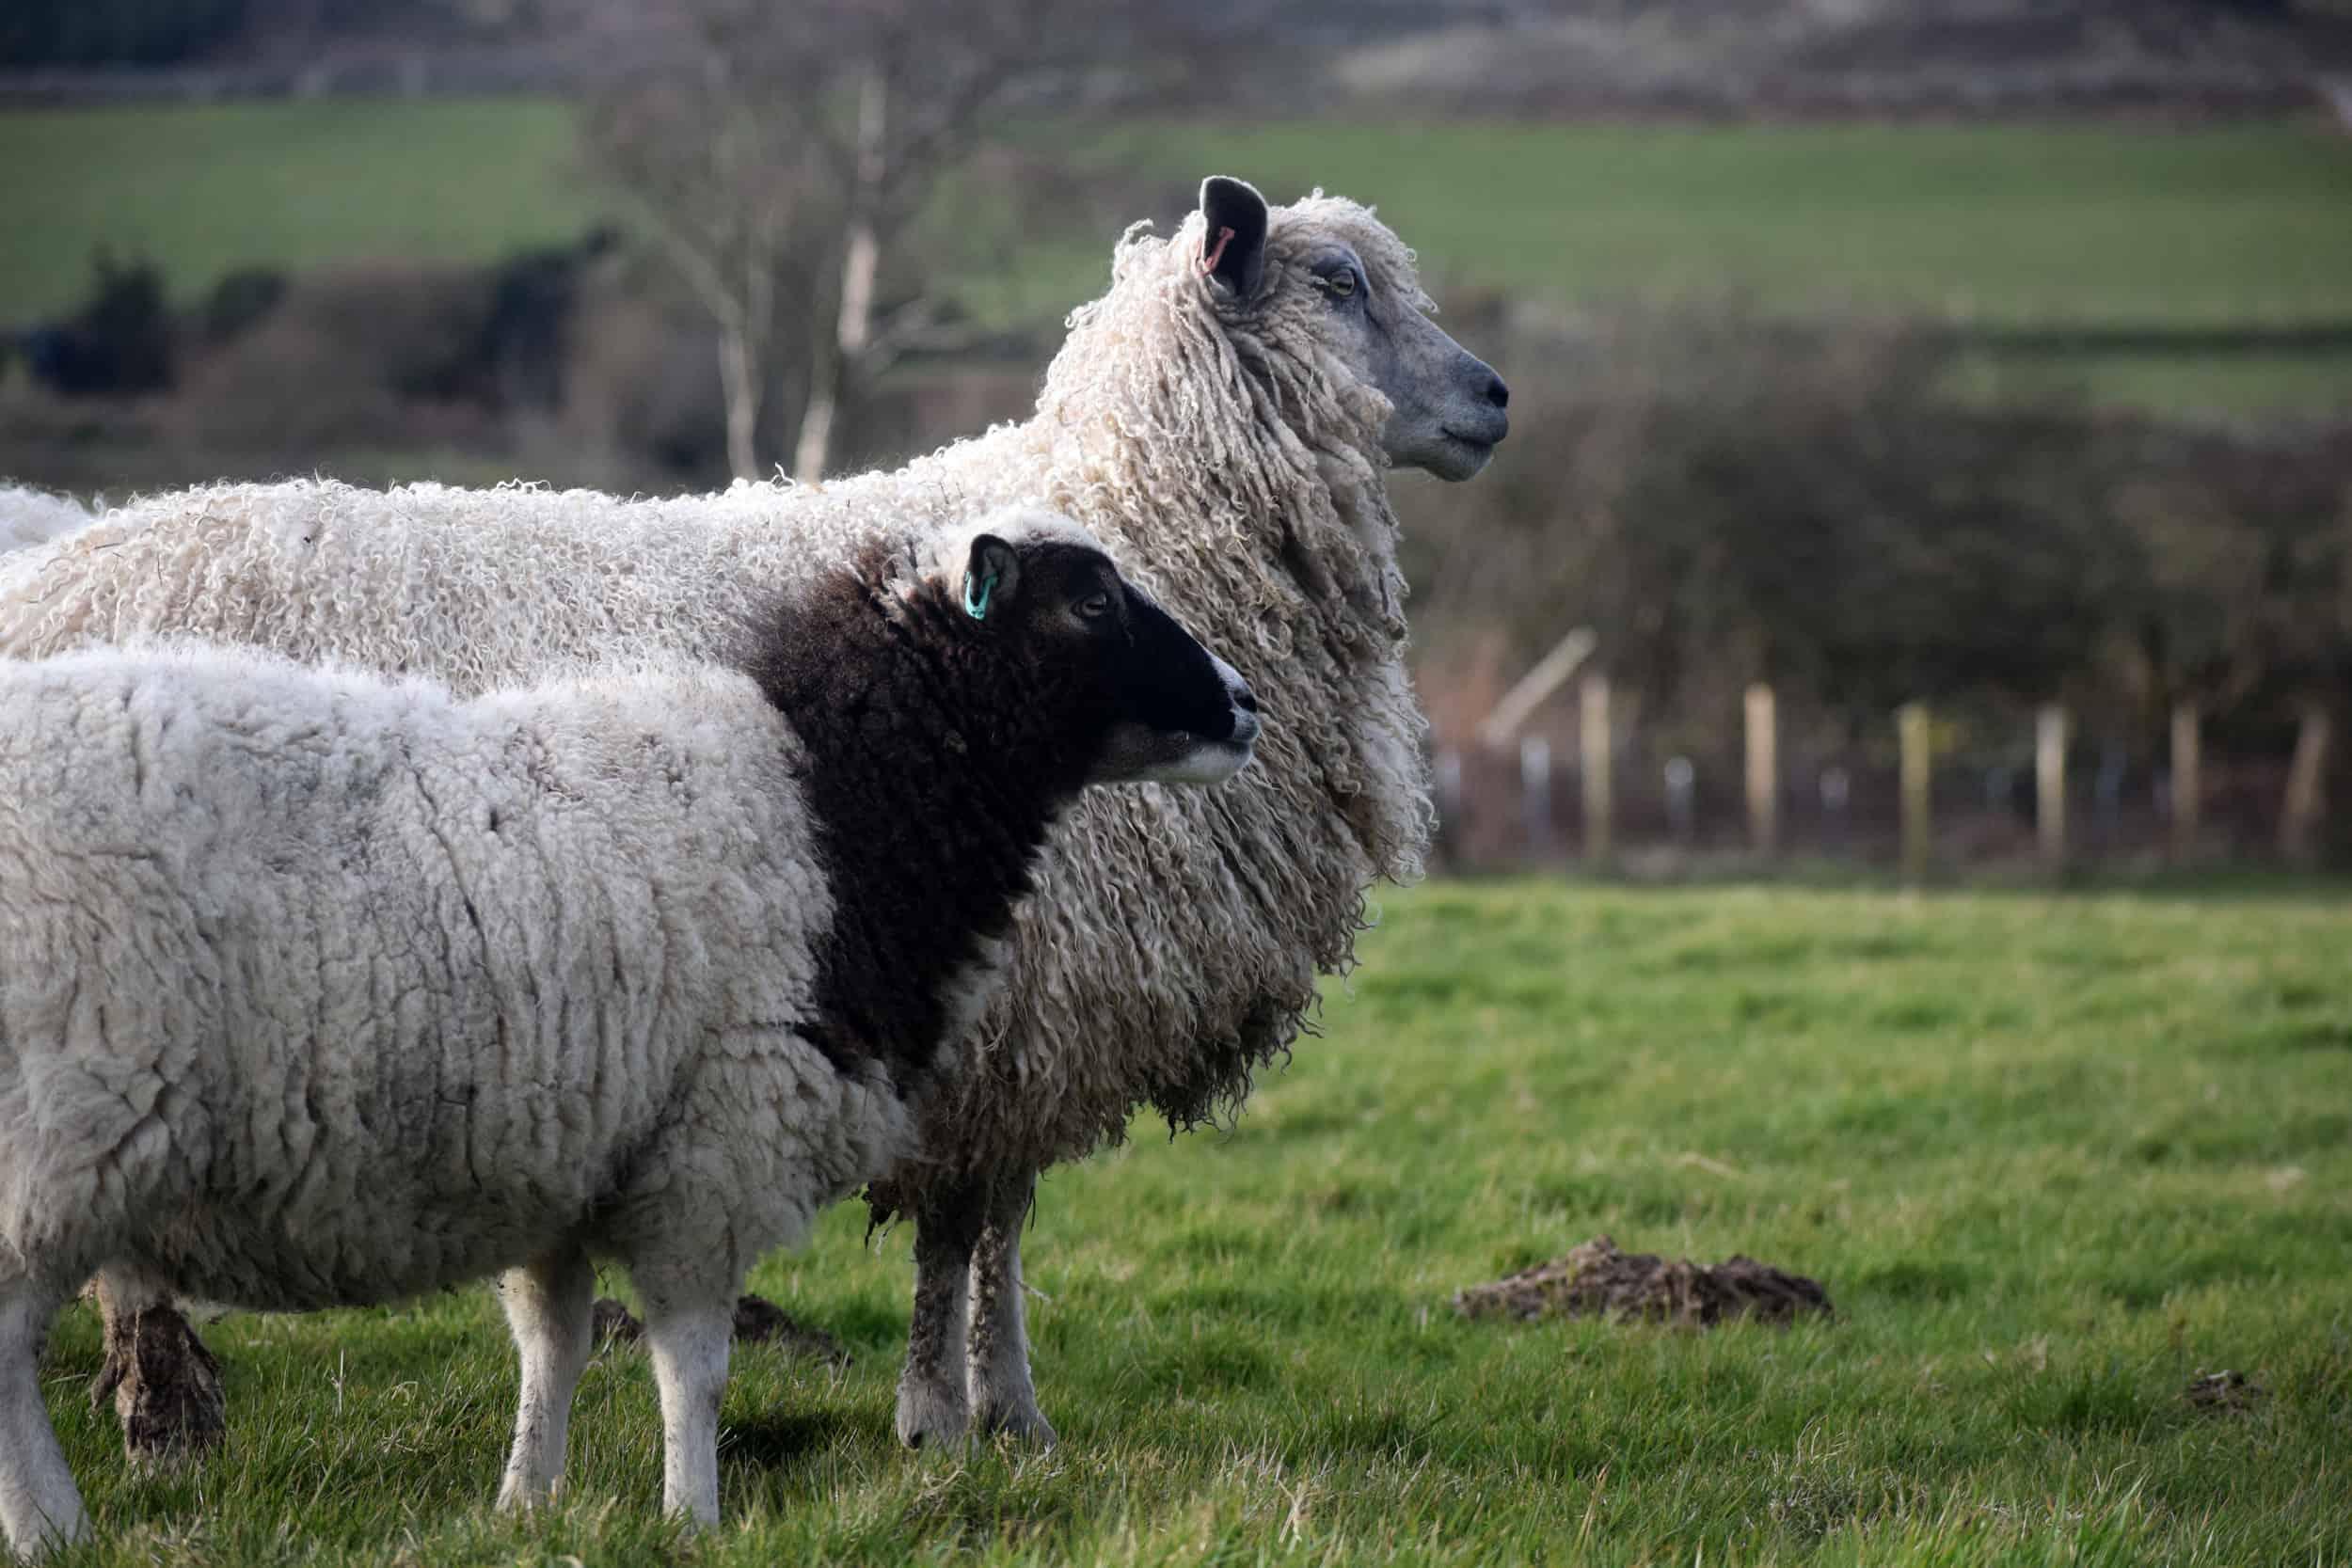 hermione texel x wensleydale patchwork sheep 4